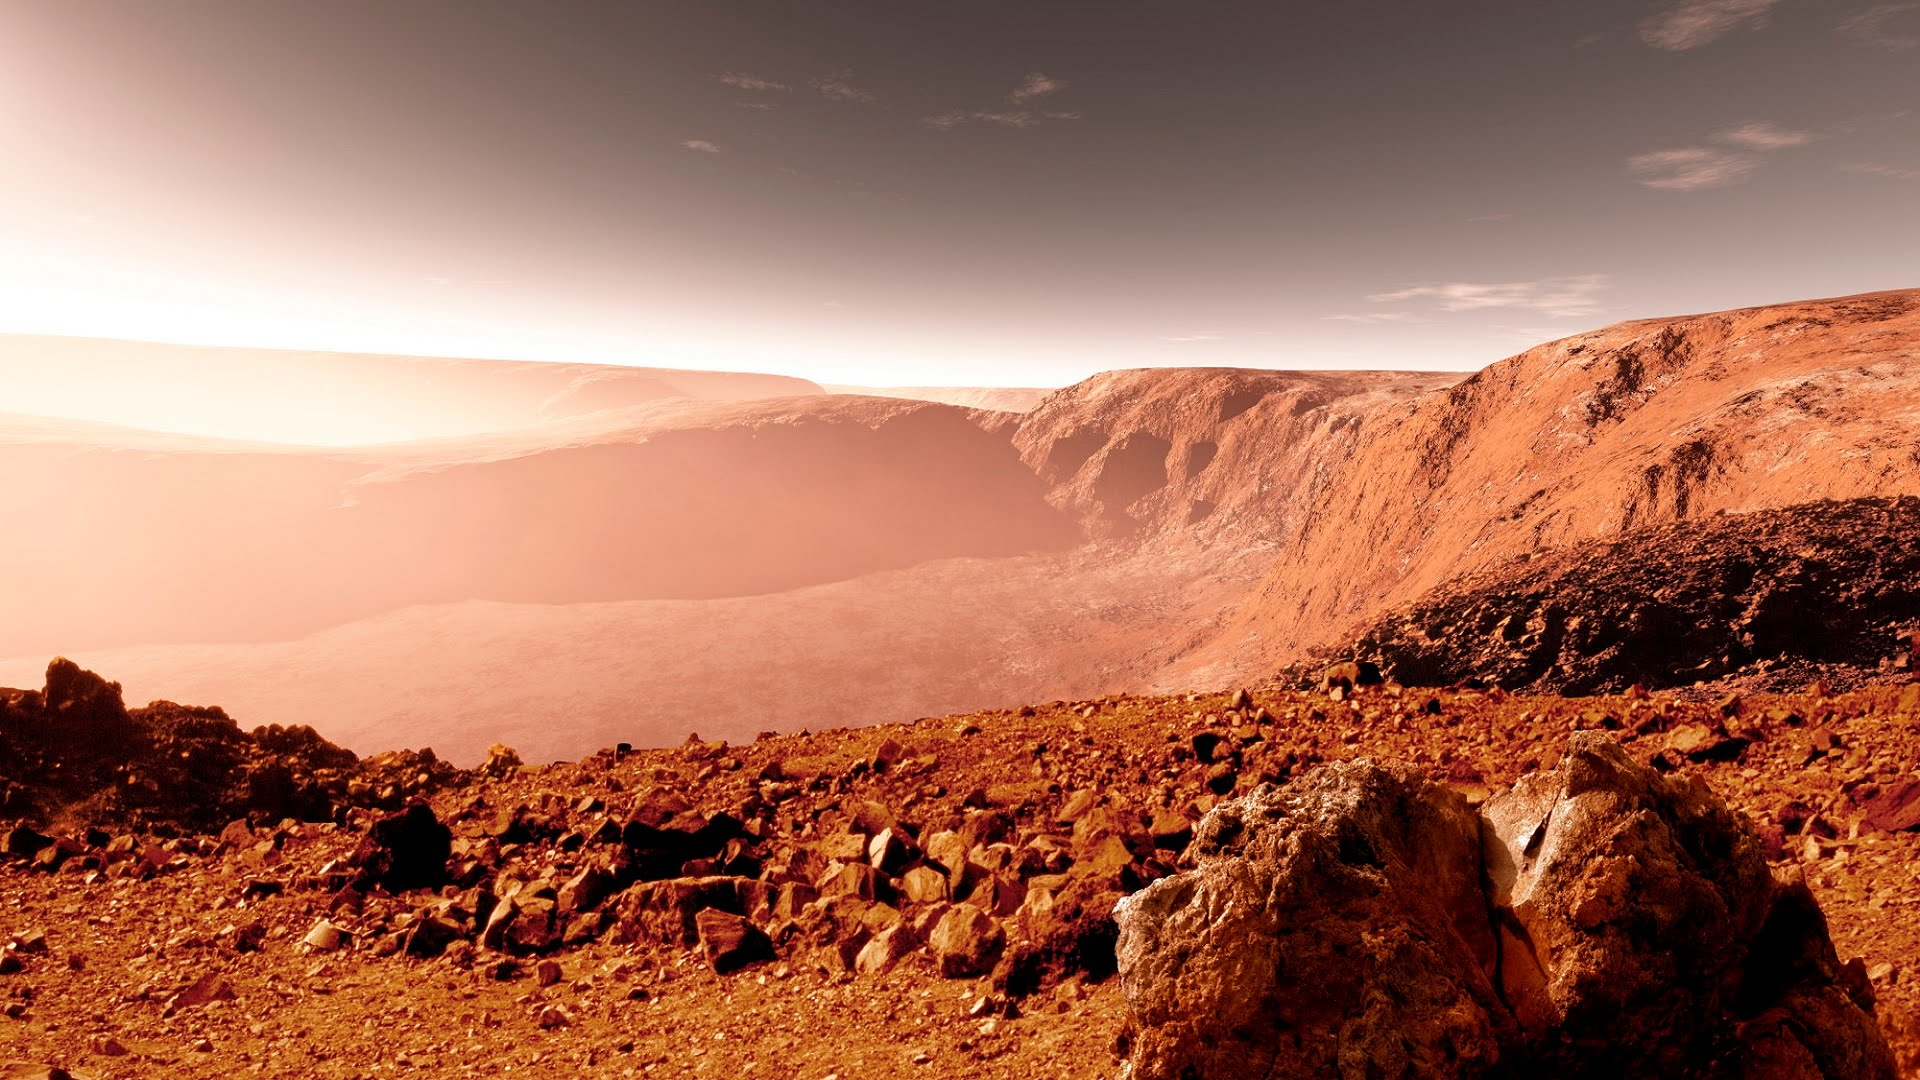 mars landscape images - HD2000×1000